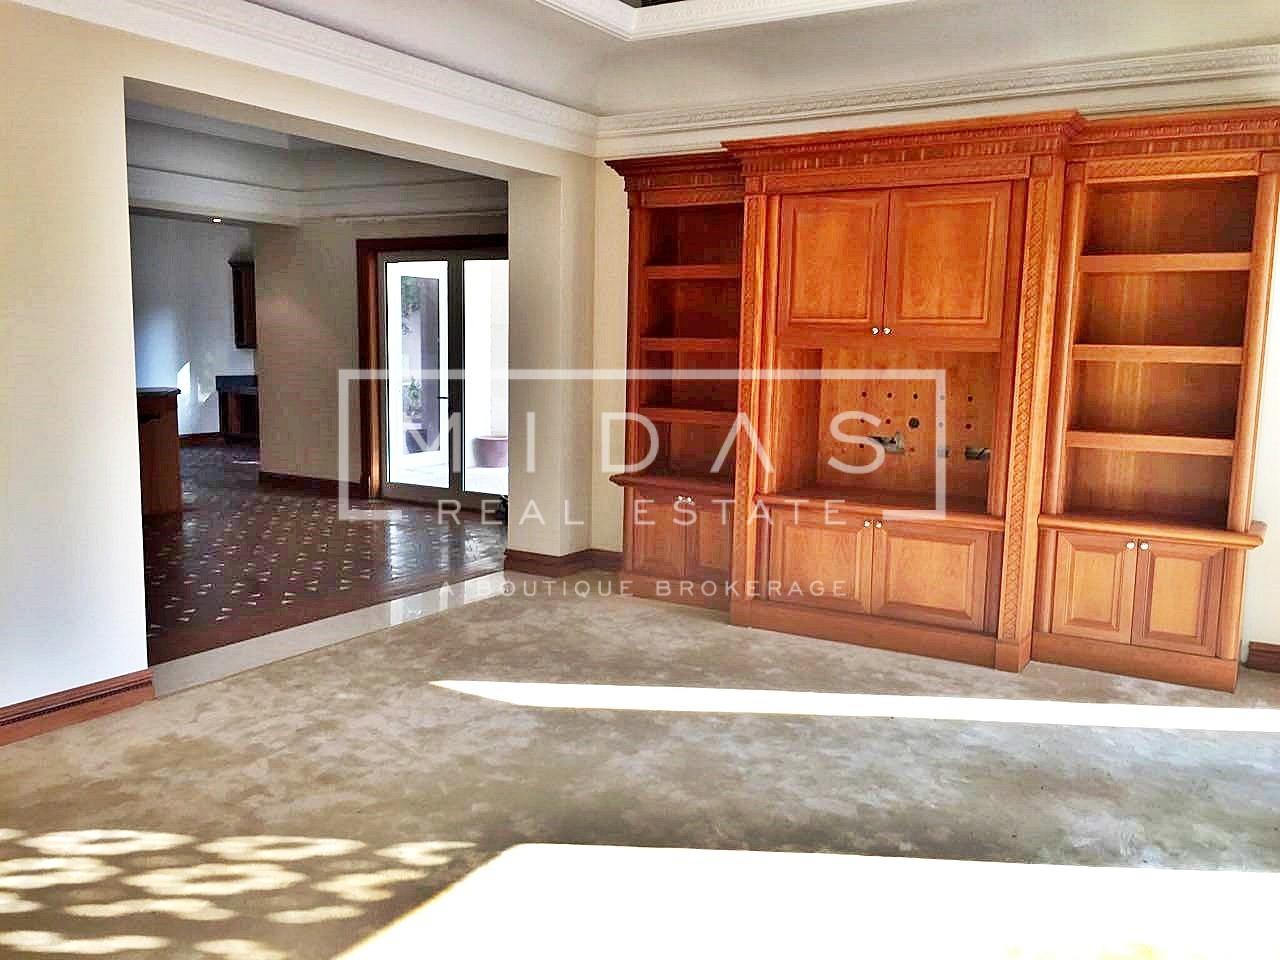 Luxurious 6BR+Majlis Villa w/ Golf Course View